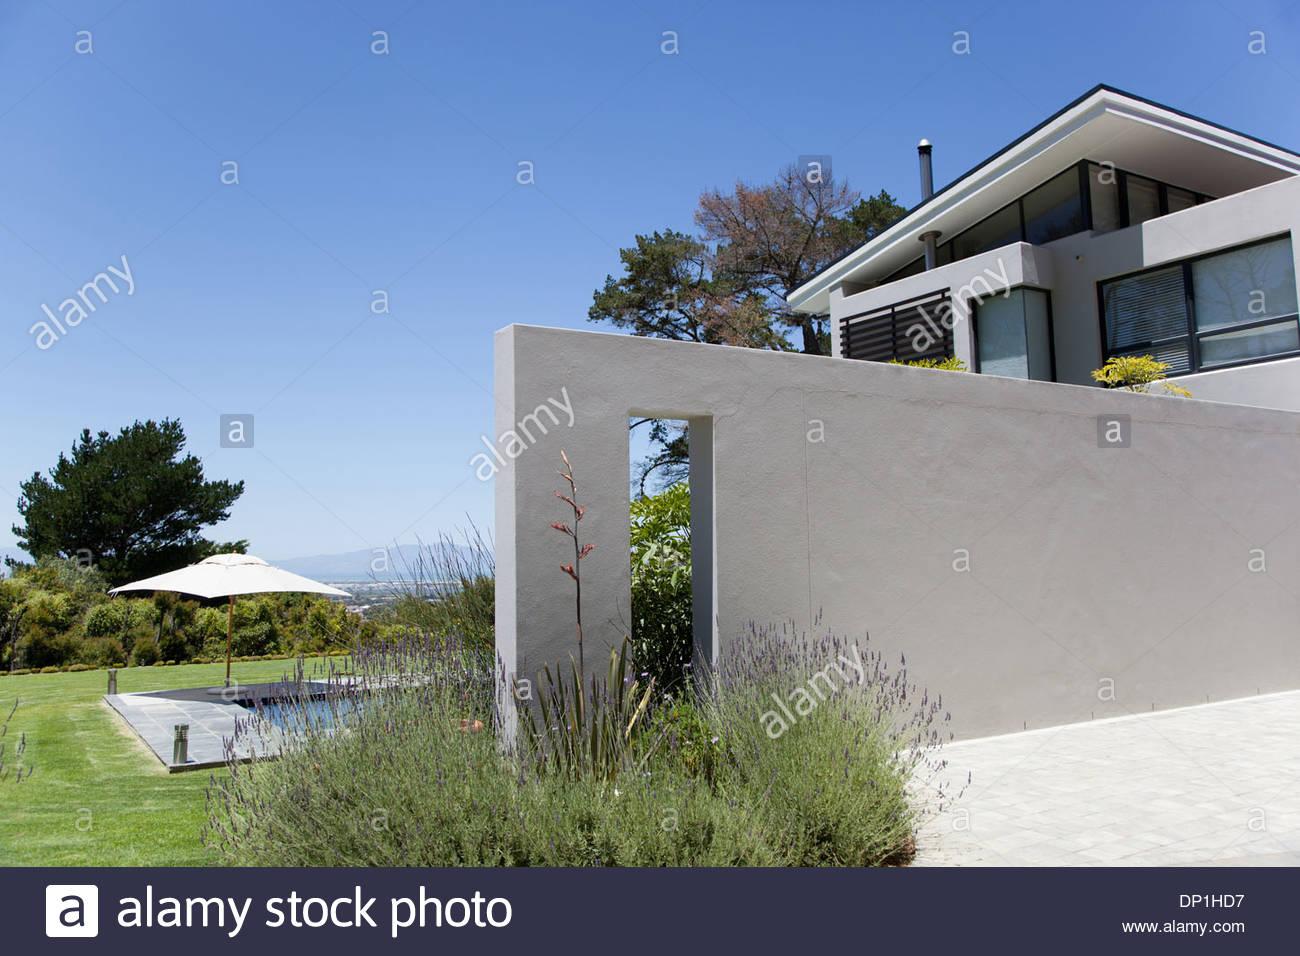 Wall outside modern house - Stock Image